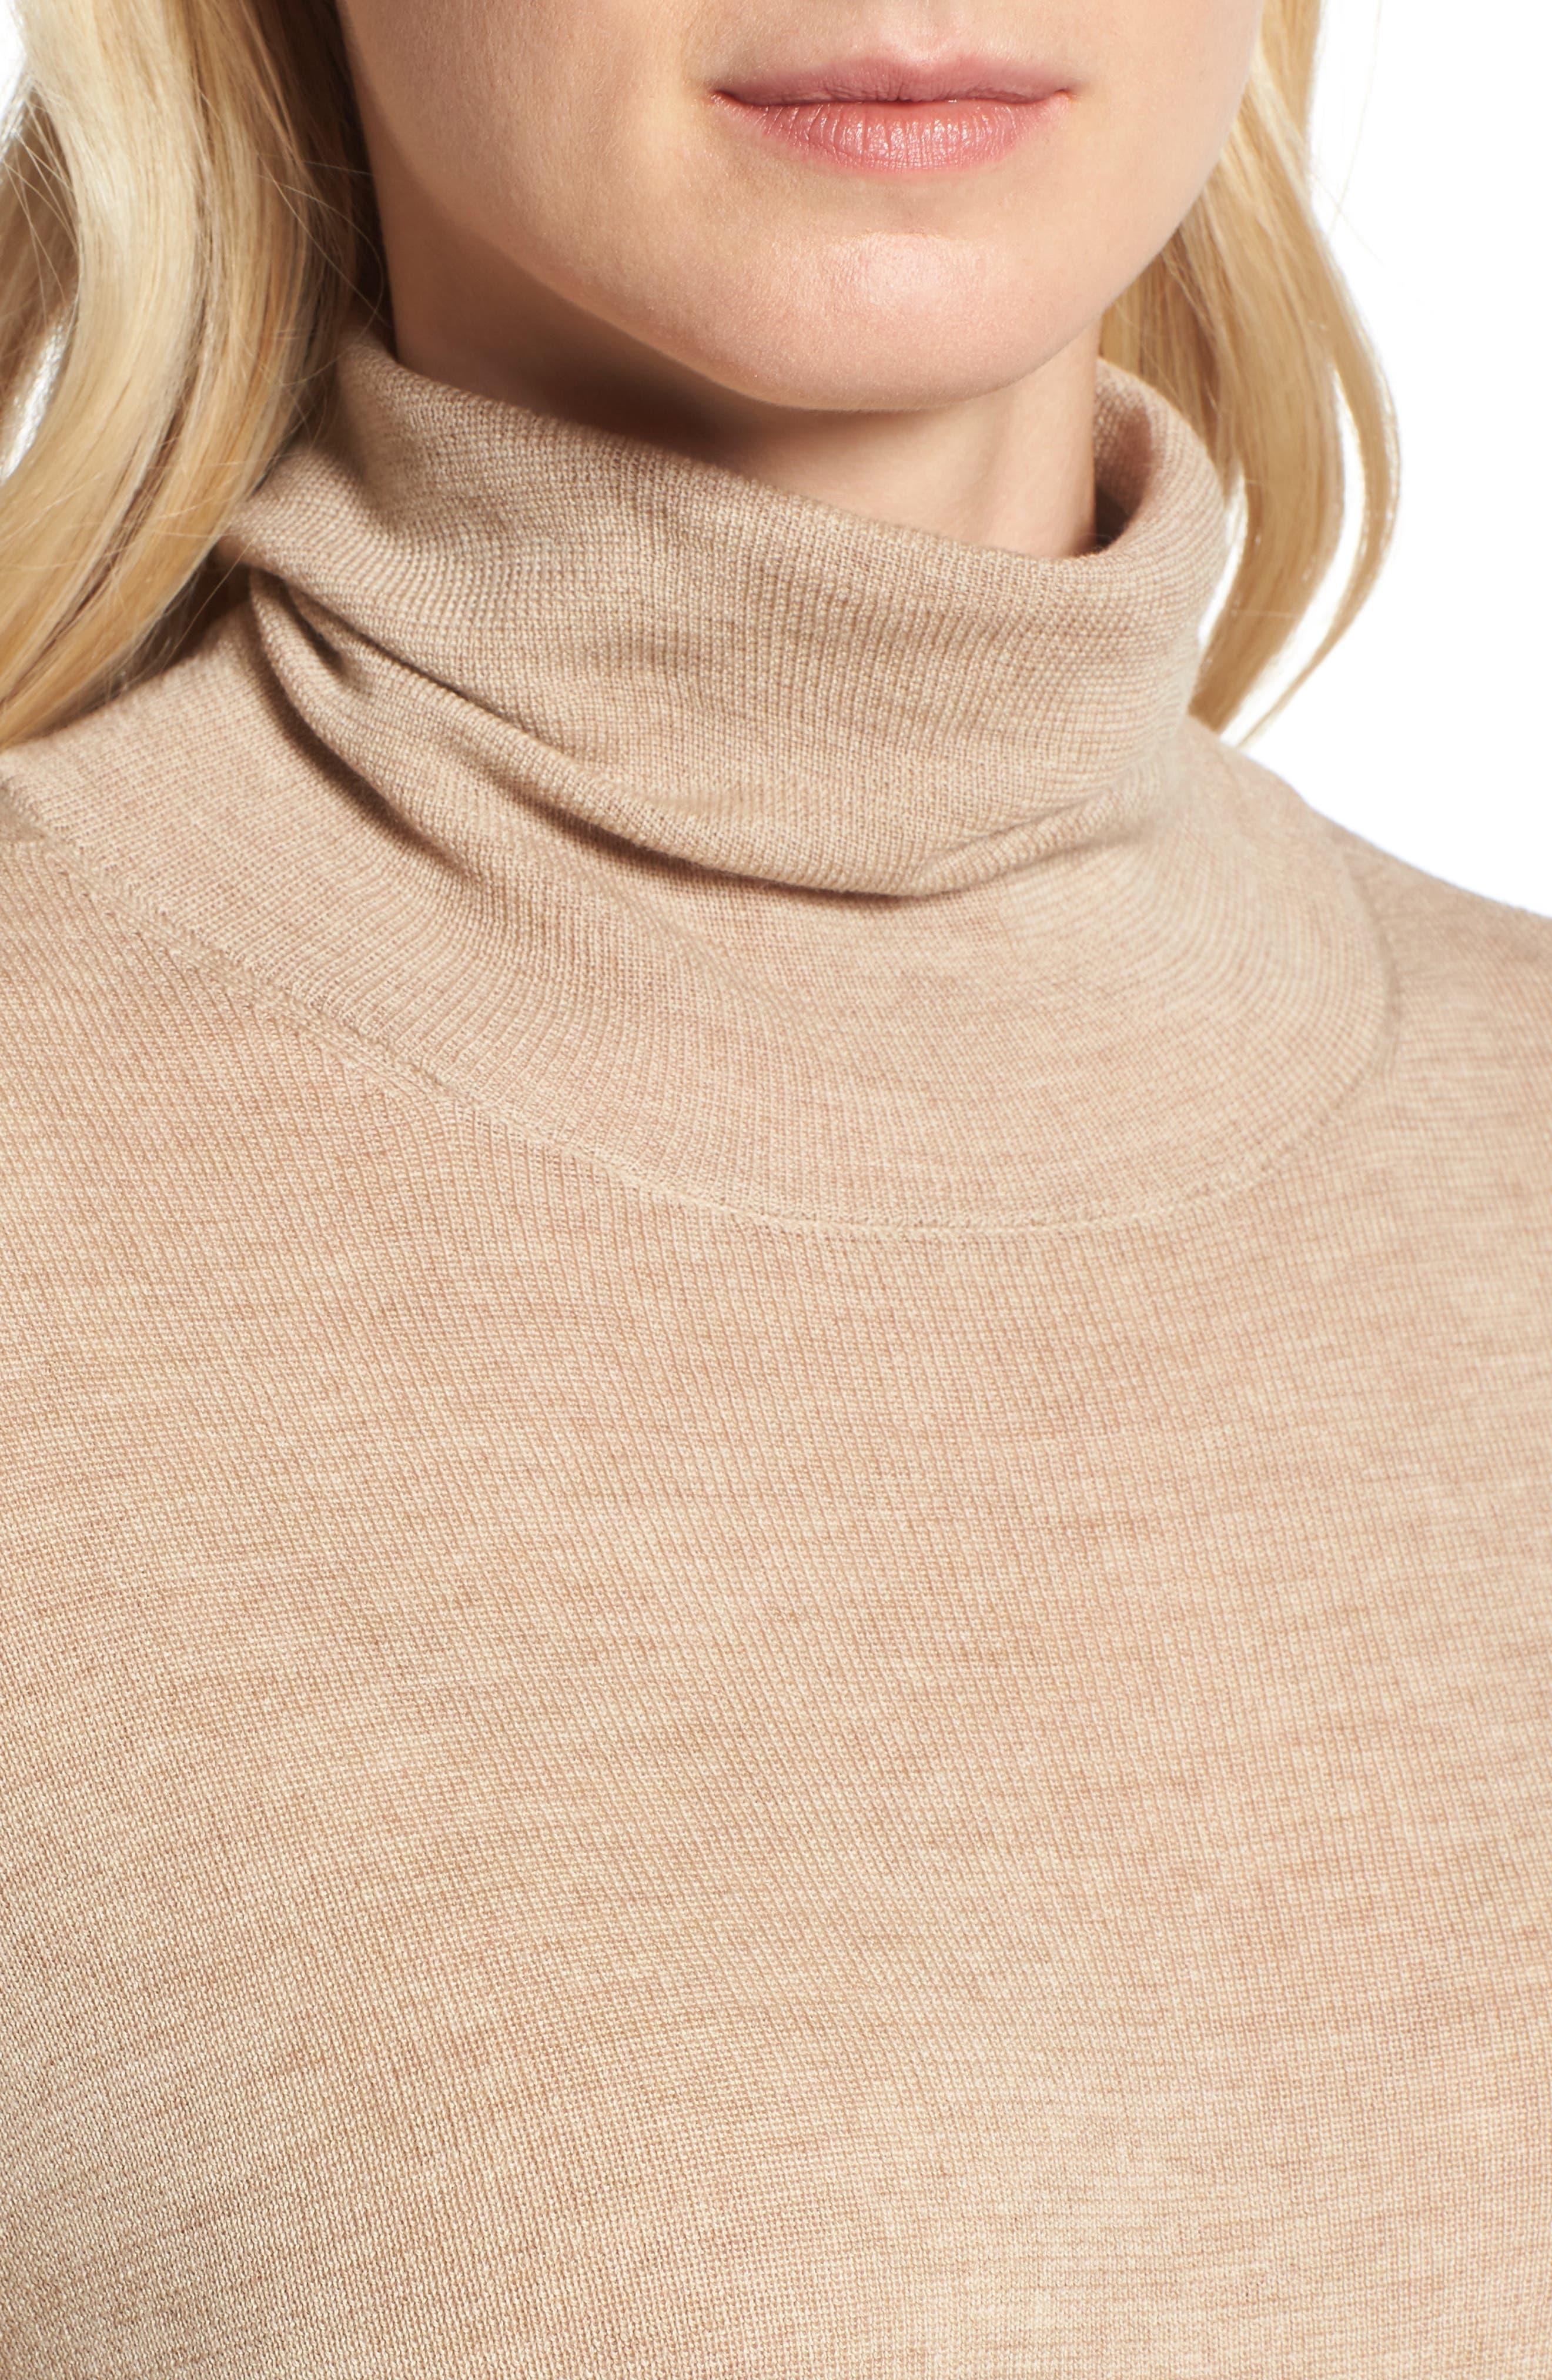 The Fisher Project Ultrafine Merino Turtleneck Sweater,                             Alternate thumbnail 4, color,                             Maple Oat